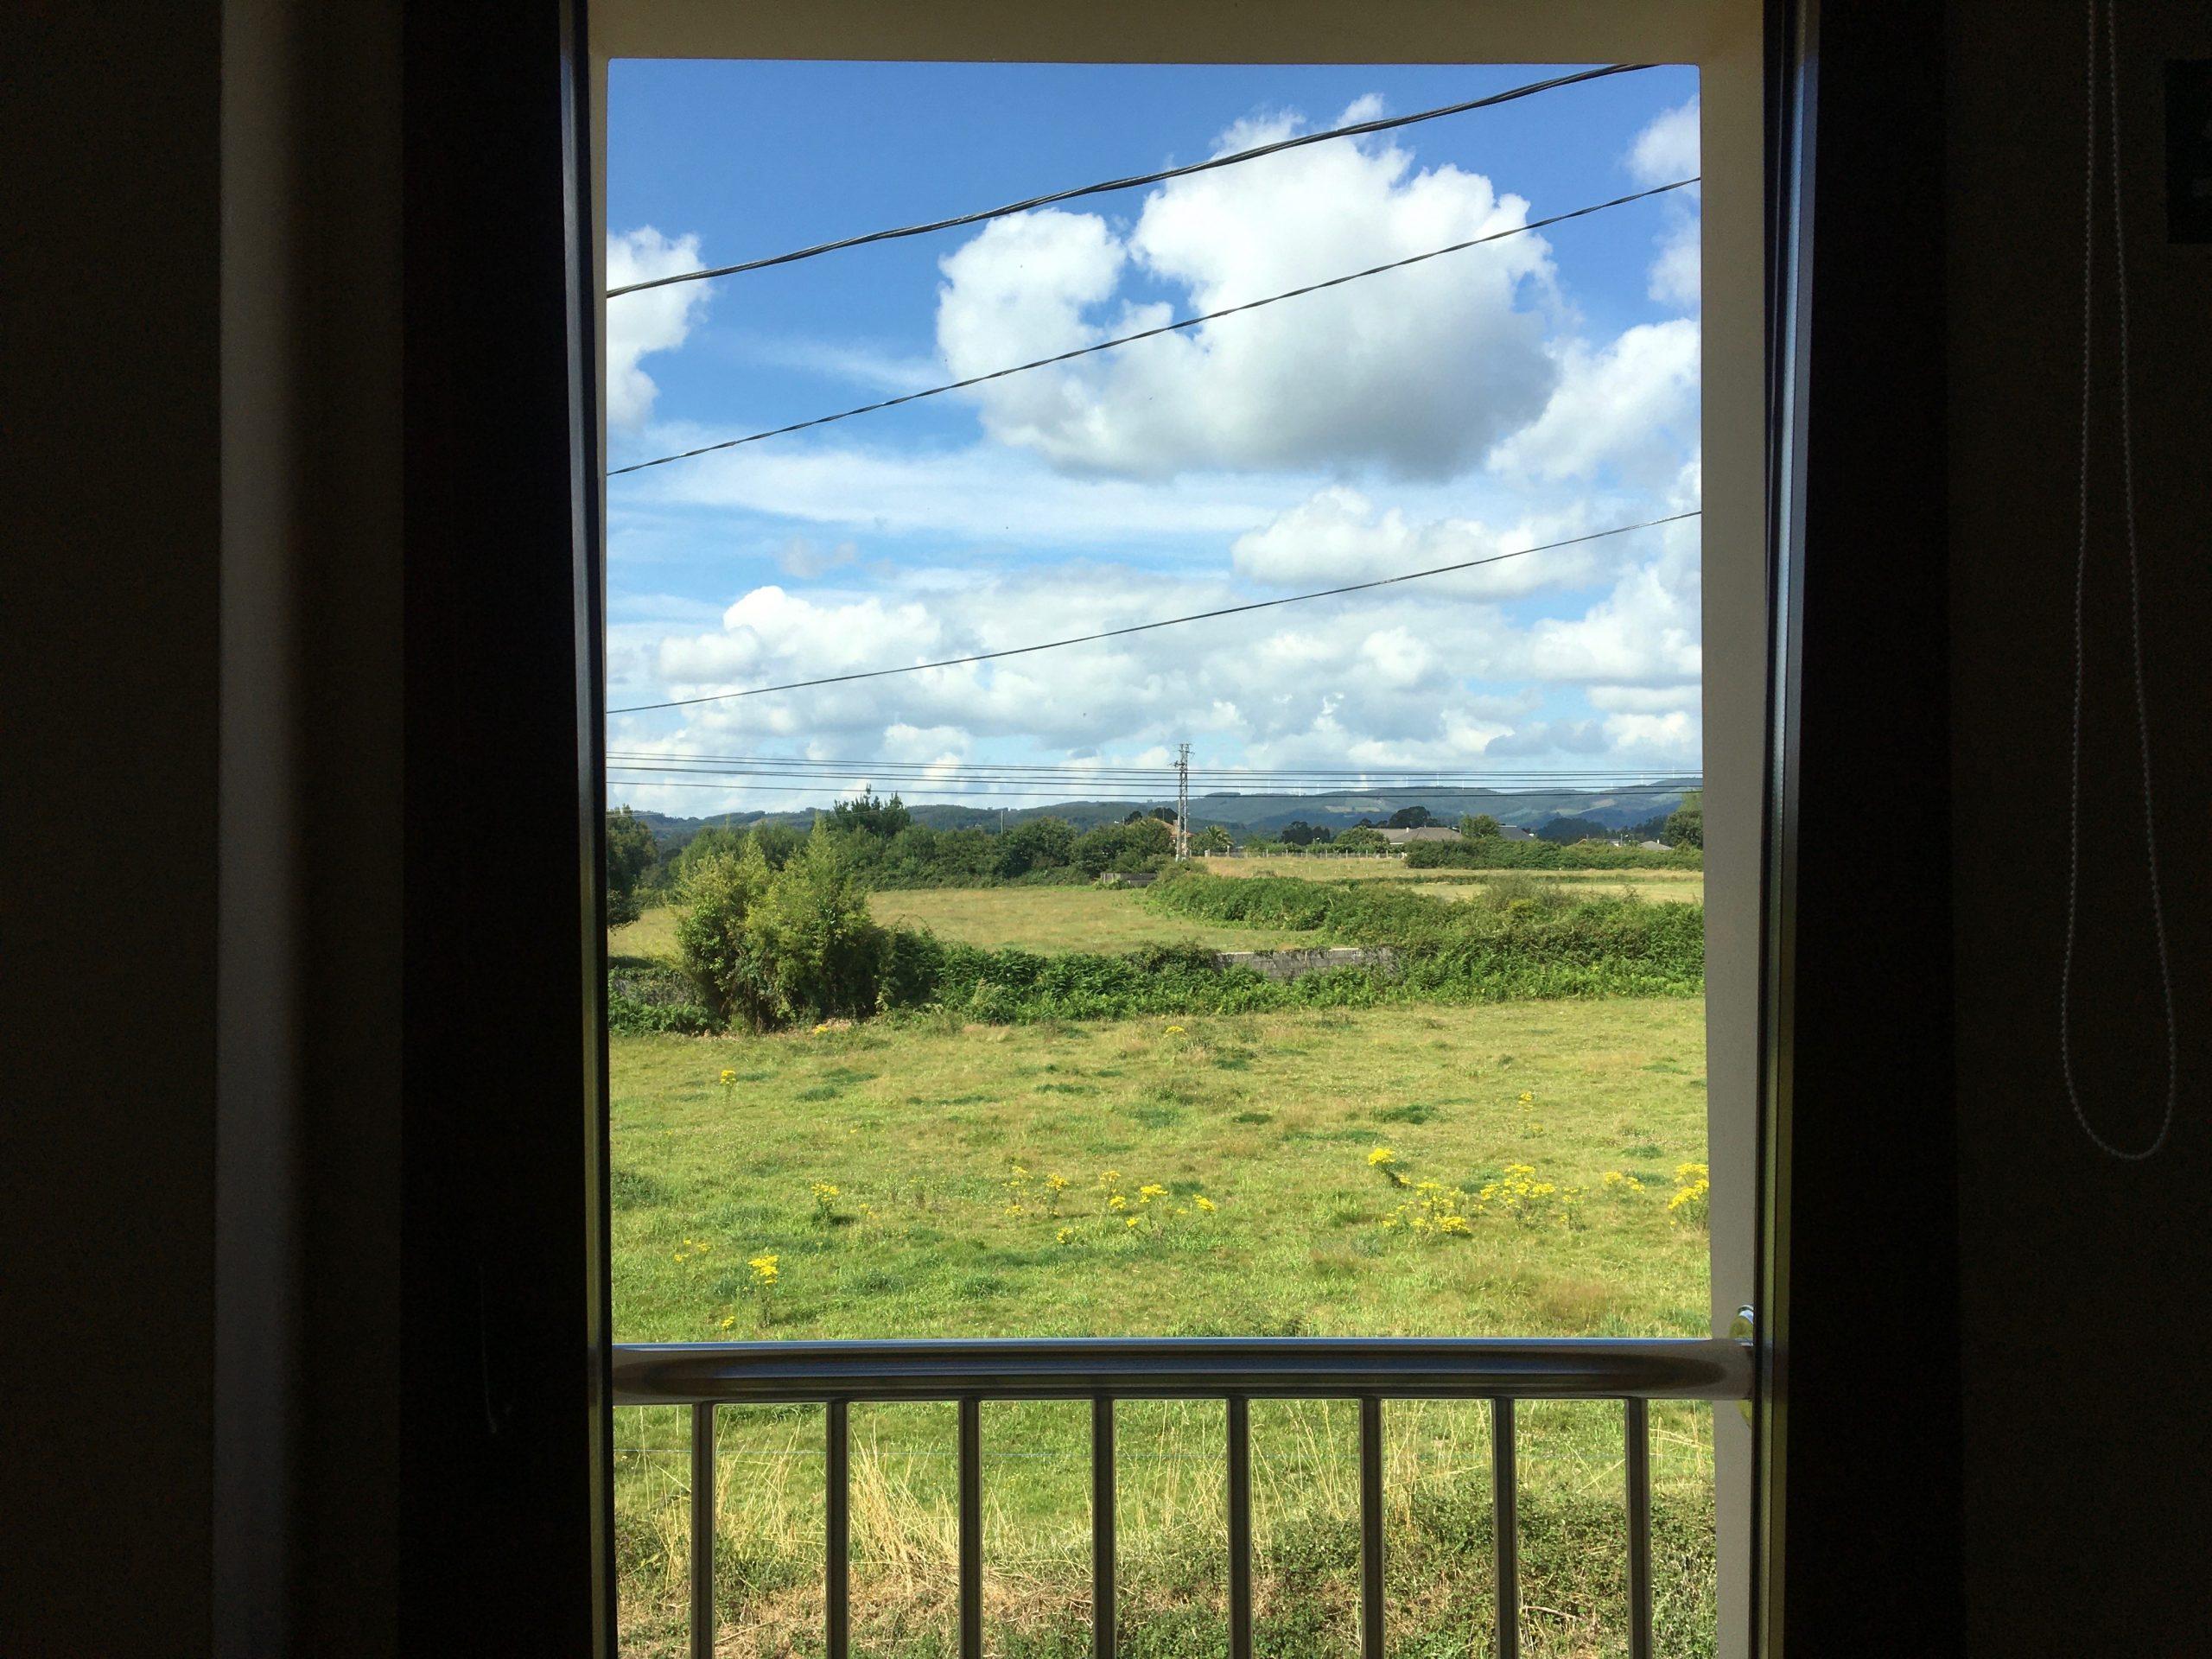 Albergue window view, Day 9 on the Camino Primitivo